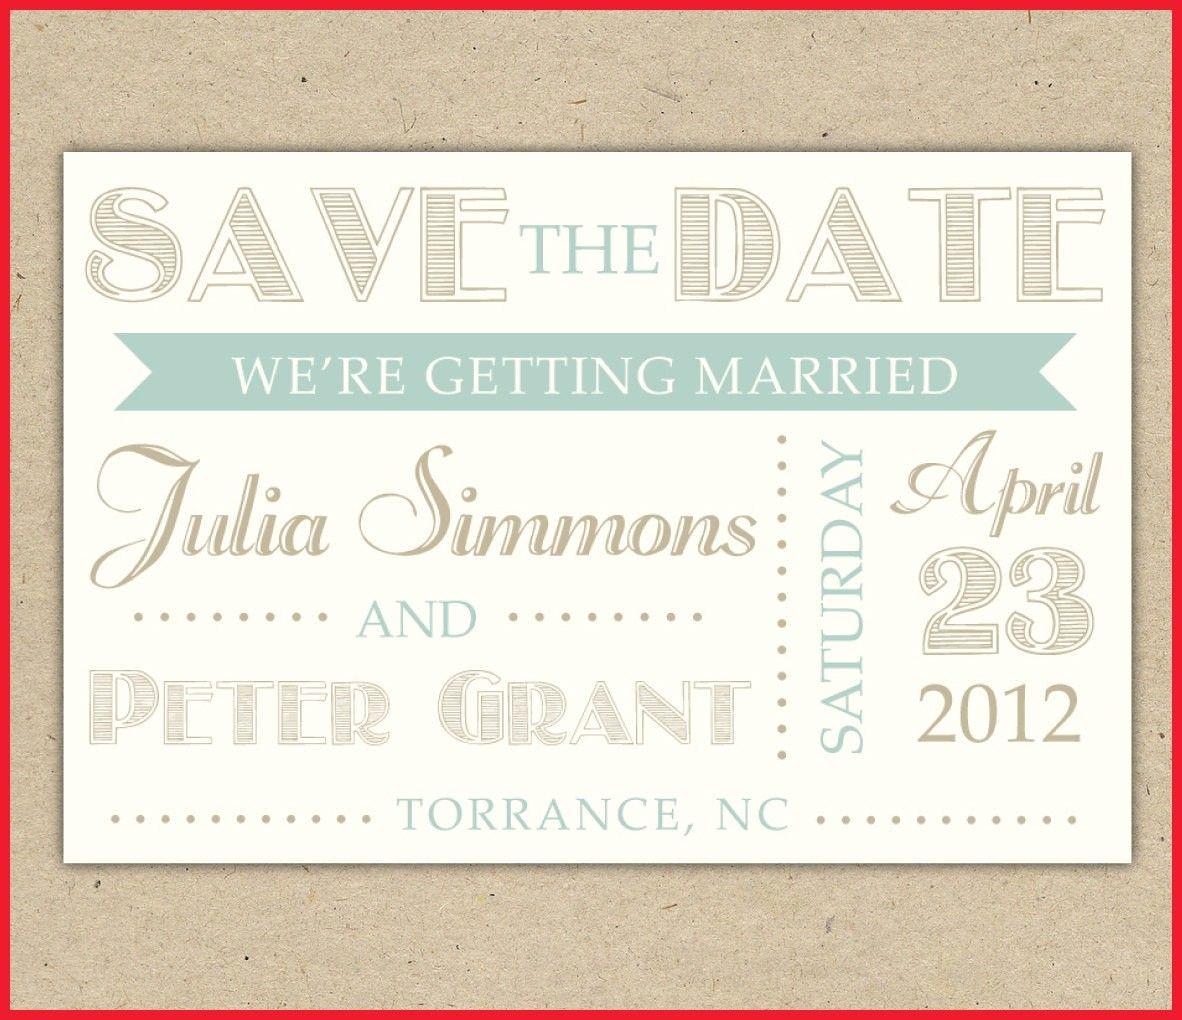 Elegant Free Printable Save The Date Invitation Templates Image Of - Free Printable Save The Date Invitation Templates